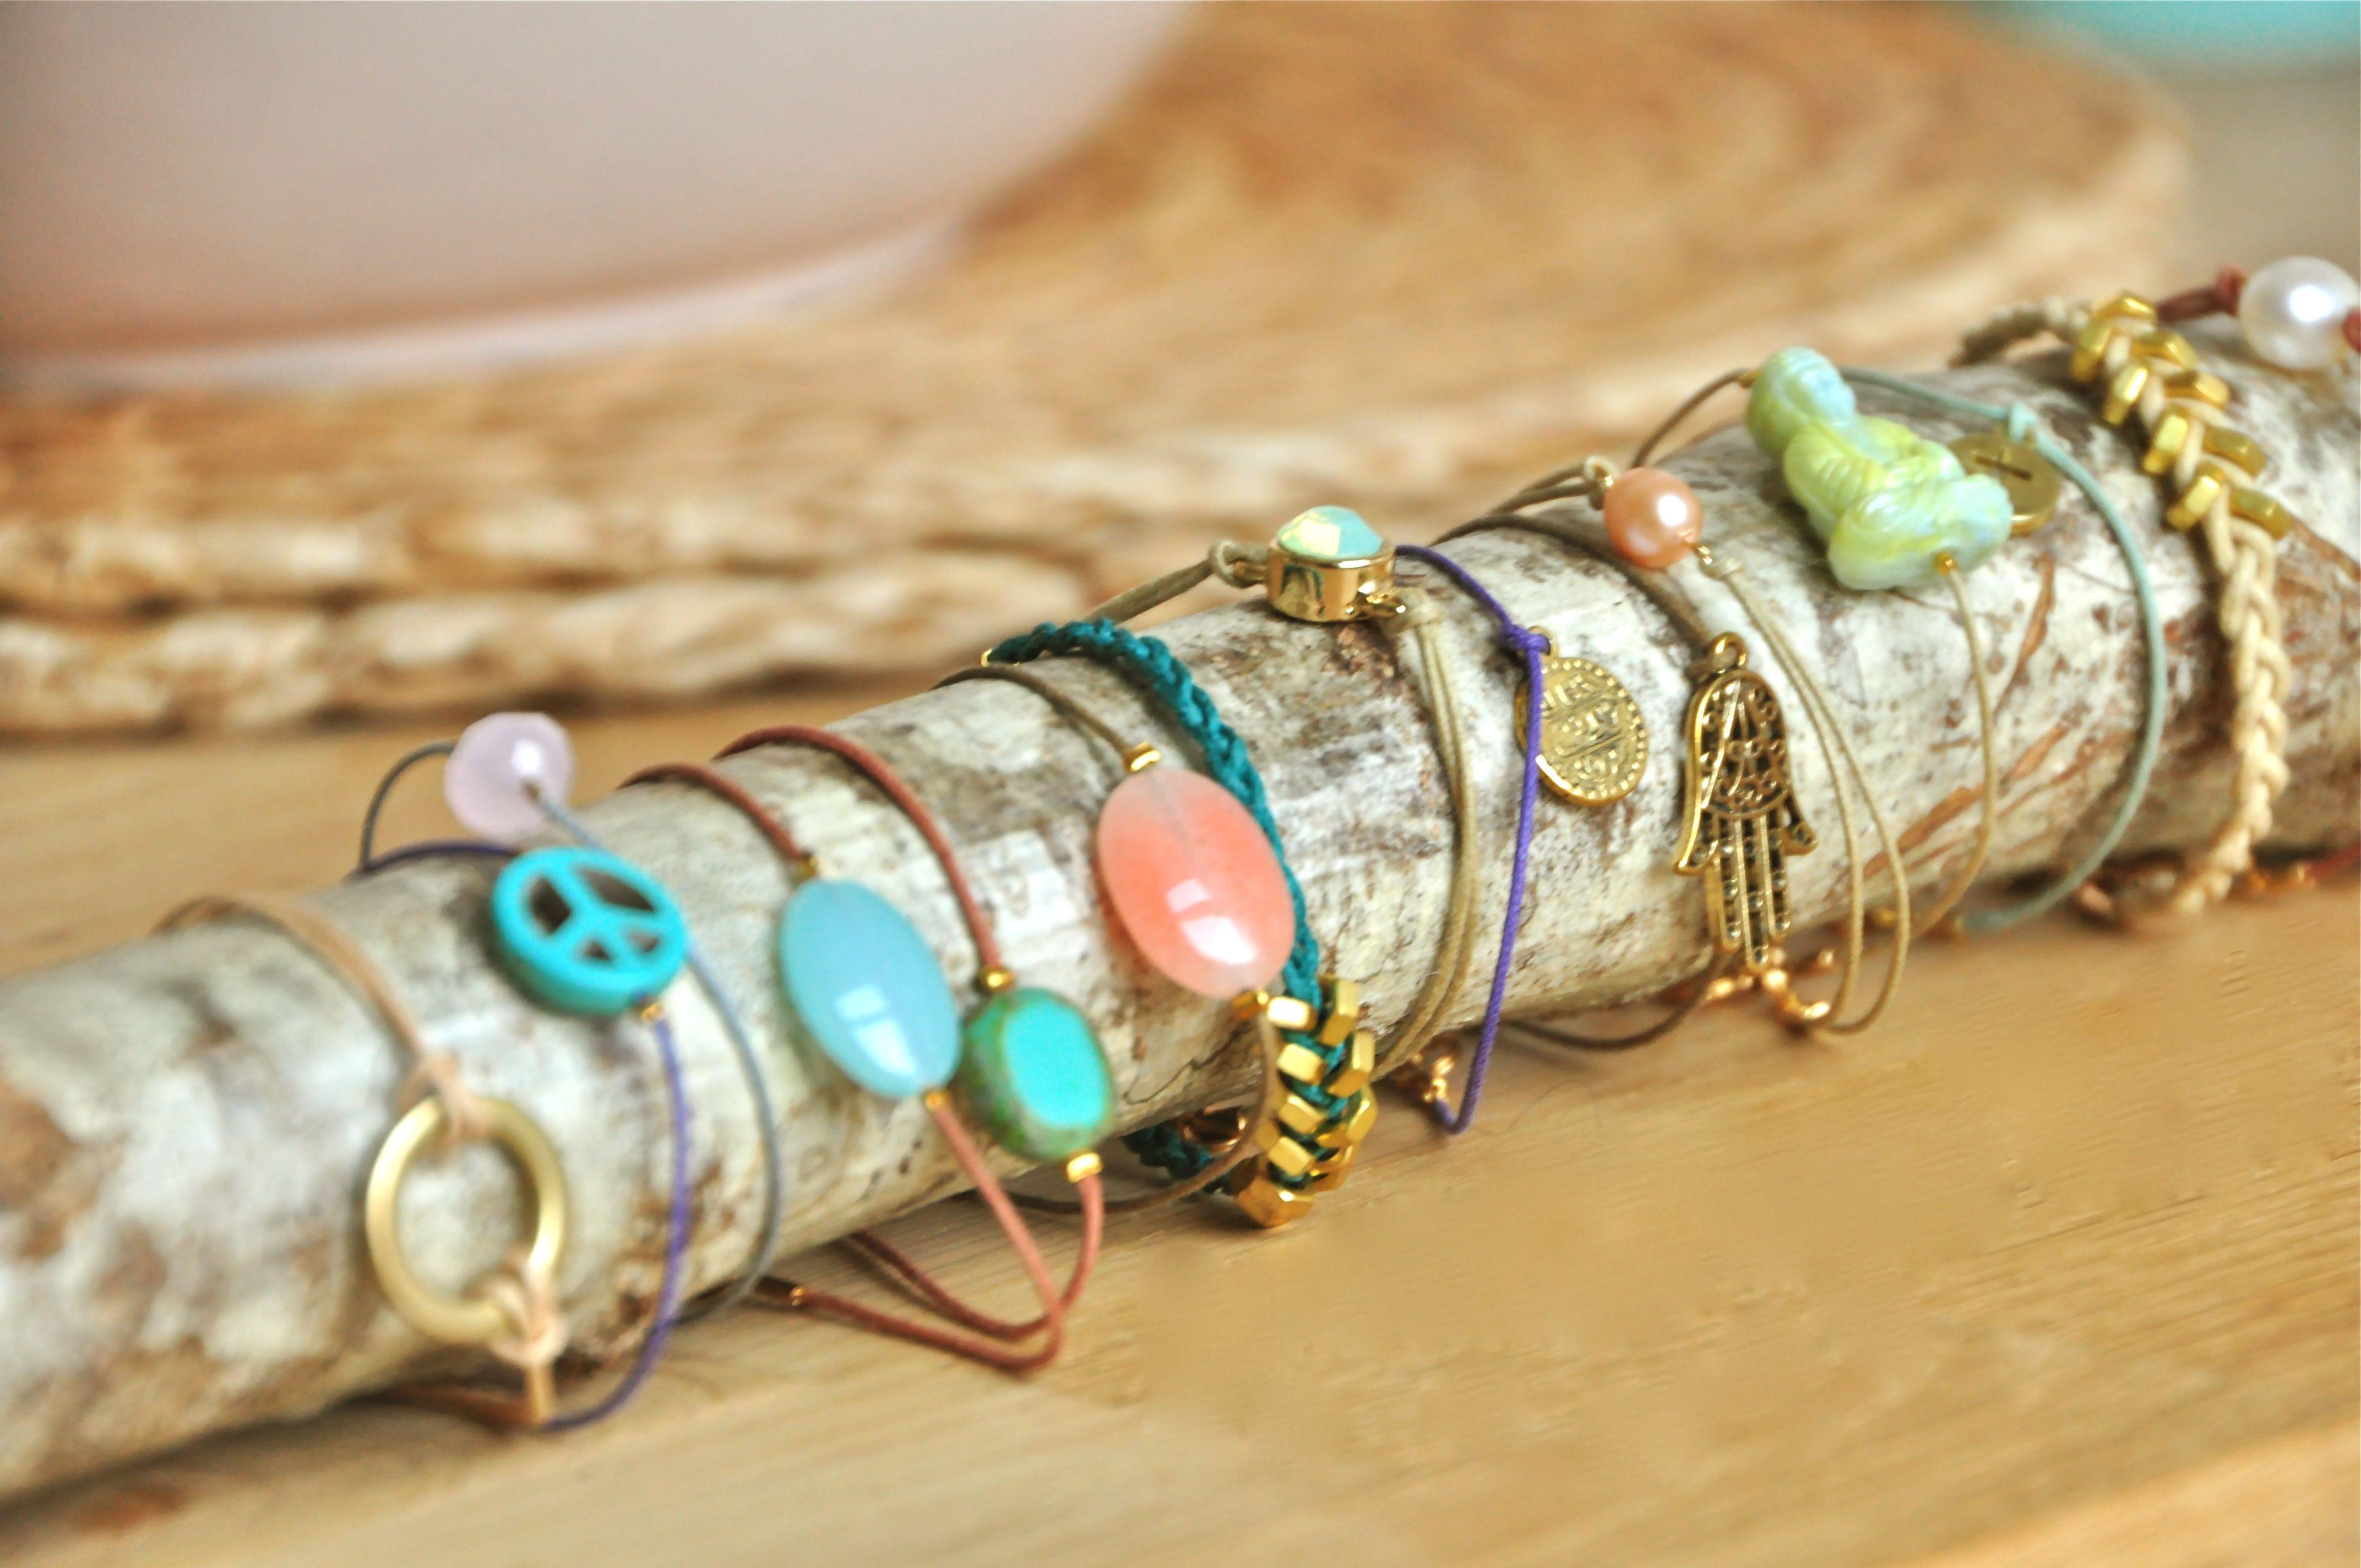 Bracelets - Follow your Bliss inspirational accessories - www.followyourbliss.nl